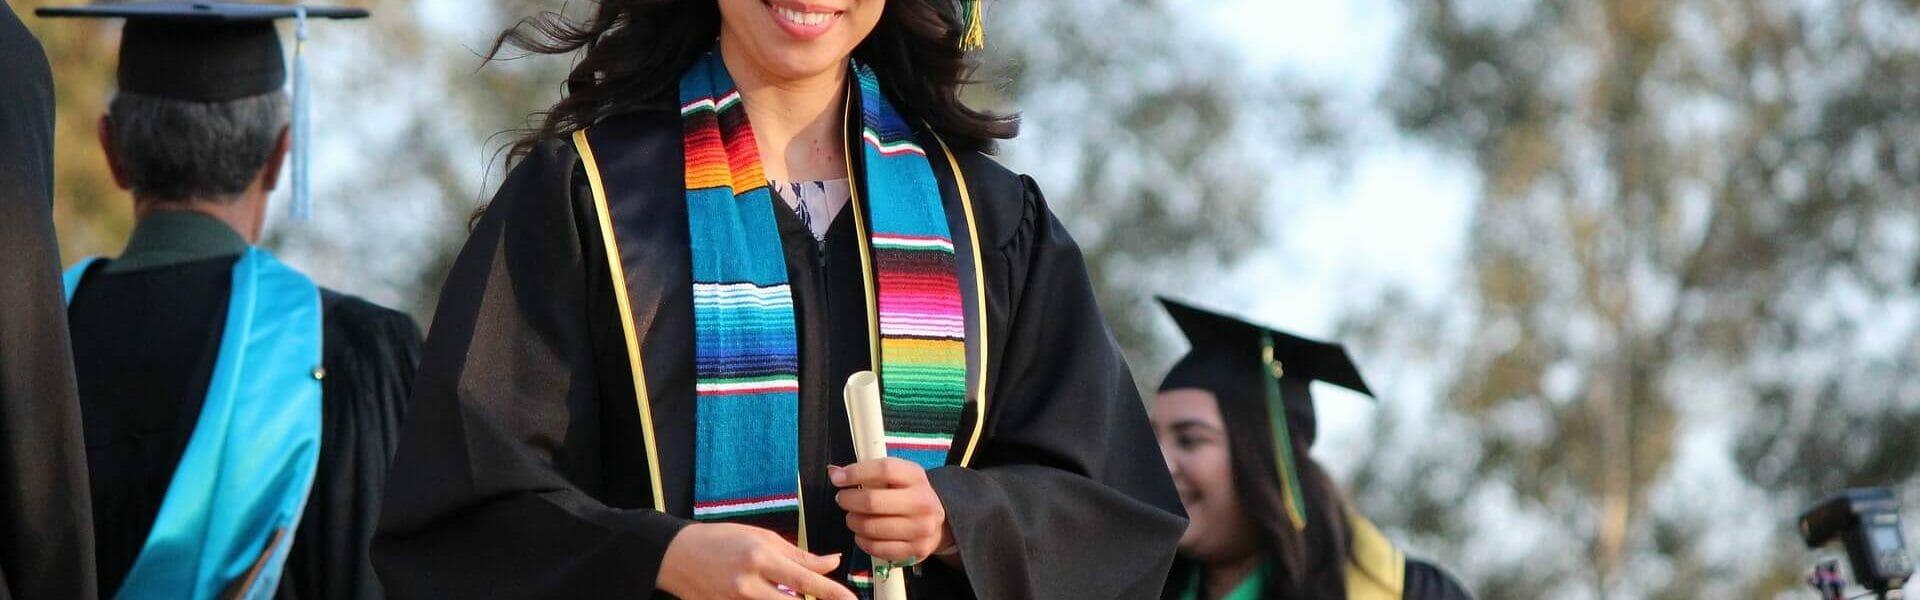 graduation-4502797_1920